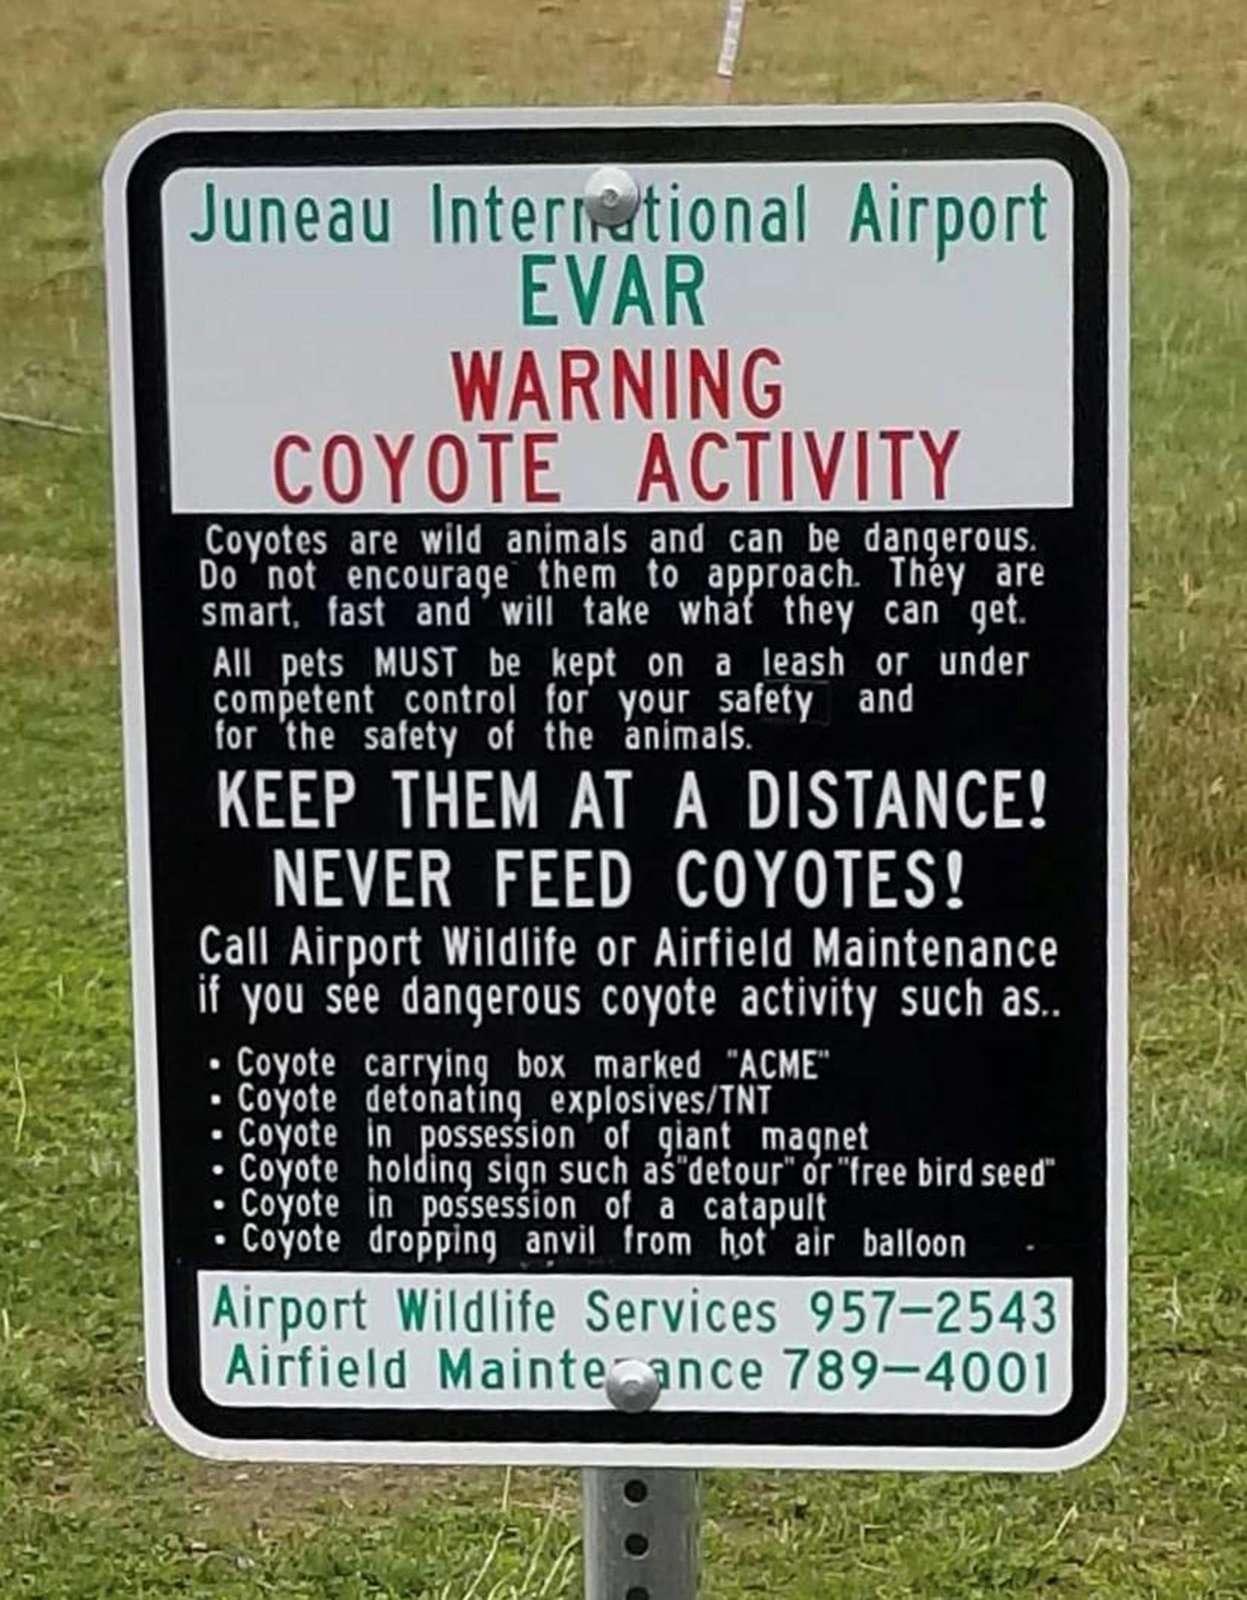 16760715_web1_airportsign-1024x1314@2x.